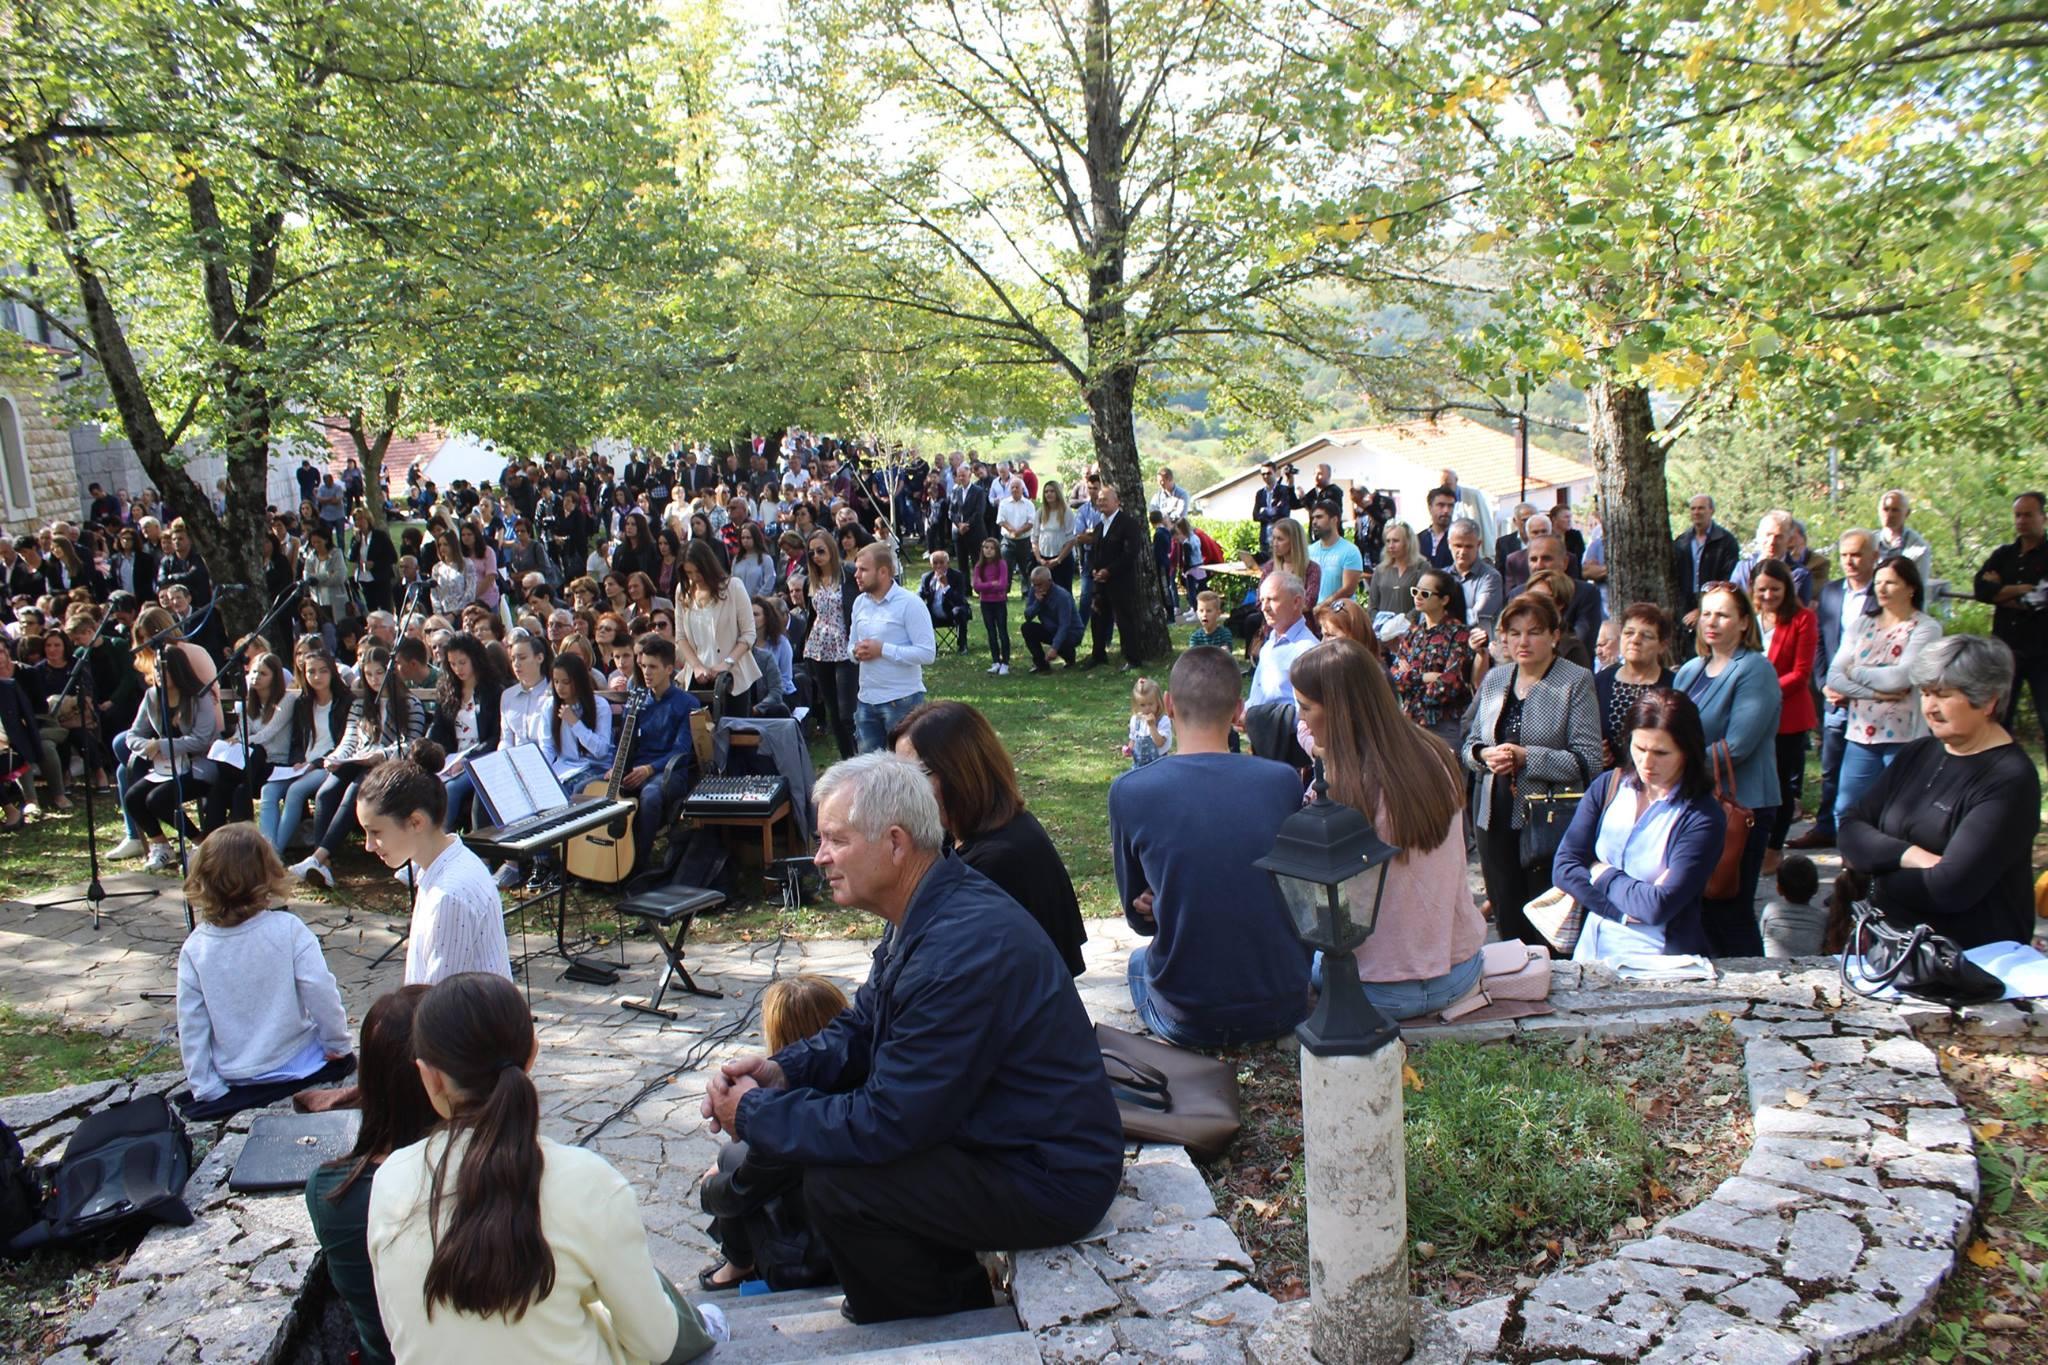 Svečano proslavljen blagdan sv. Franje Asiškog, zaštitnika župe Posuški Gradac